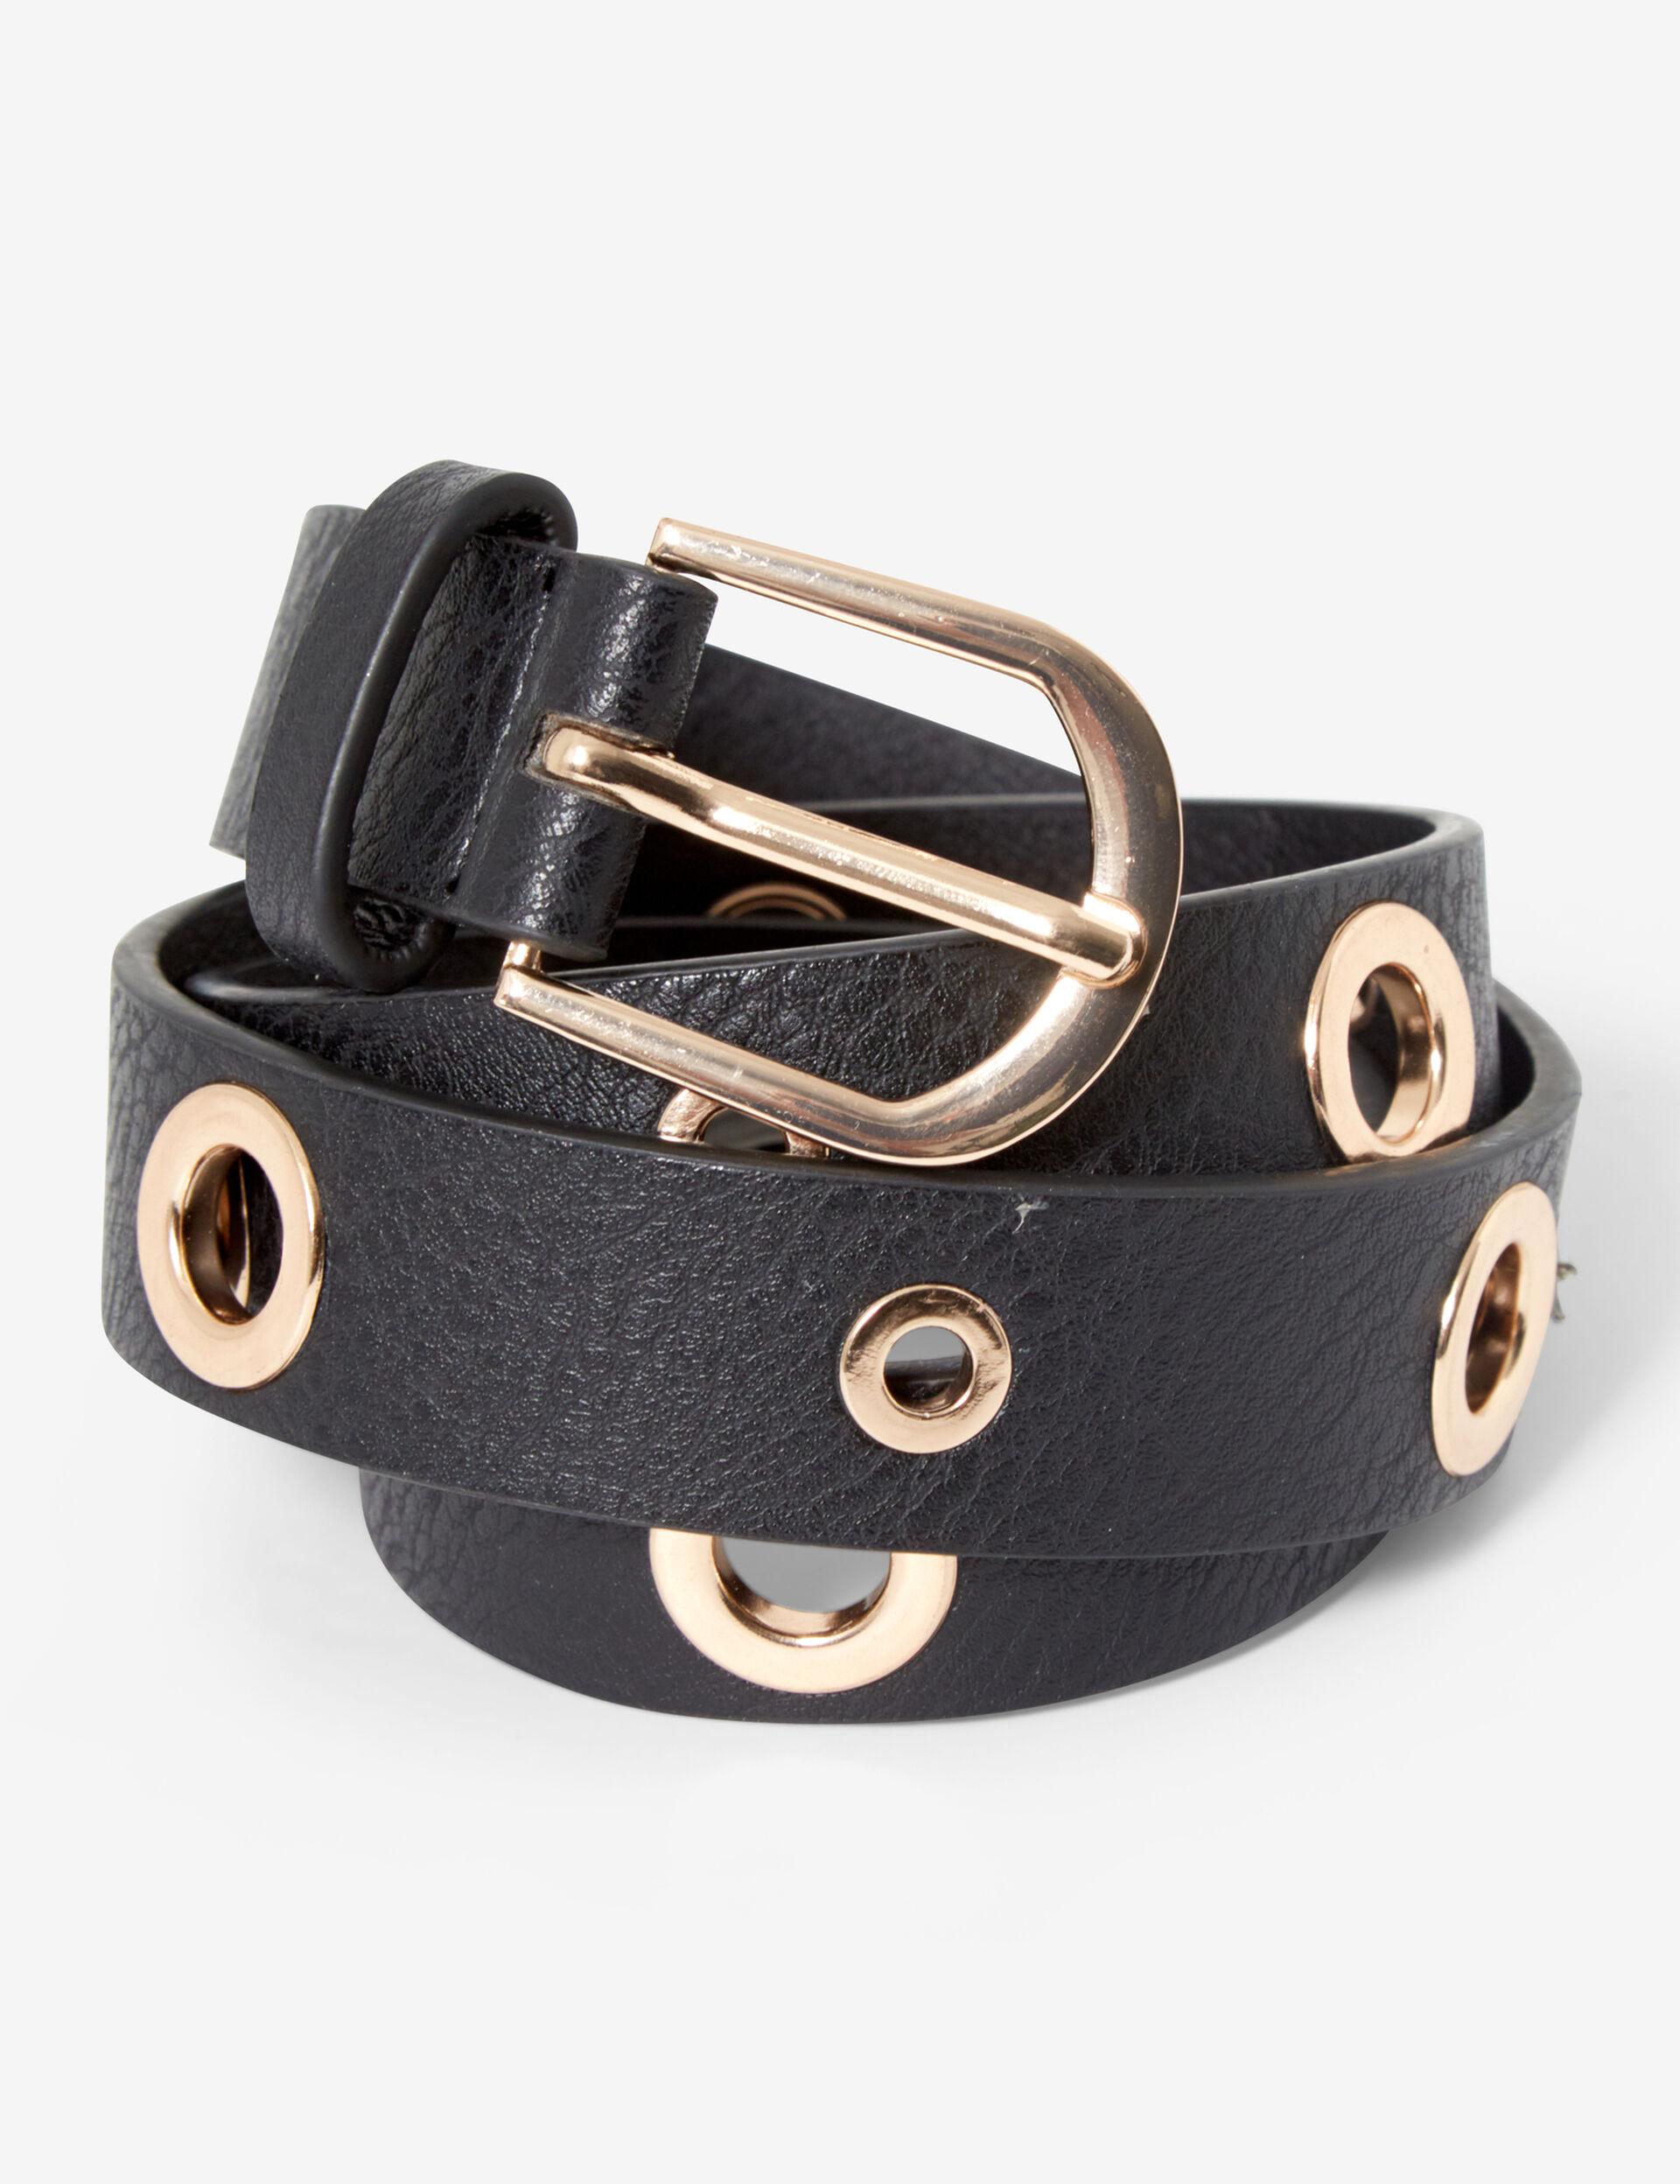 Slim belt with eyelets